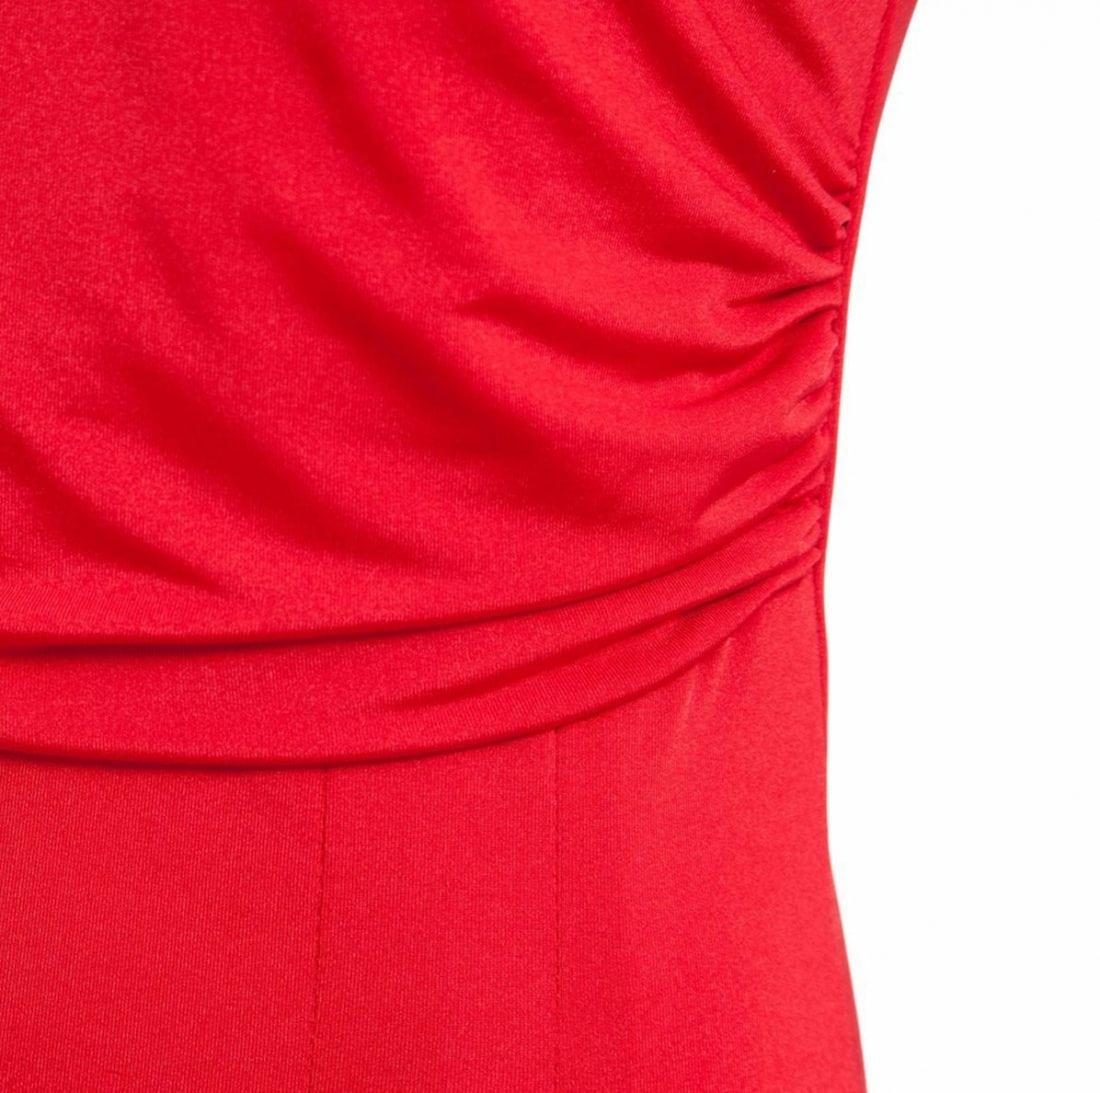 M0188 red7 Short Sleeve Dresses maureens.com boutique